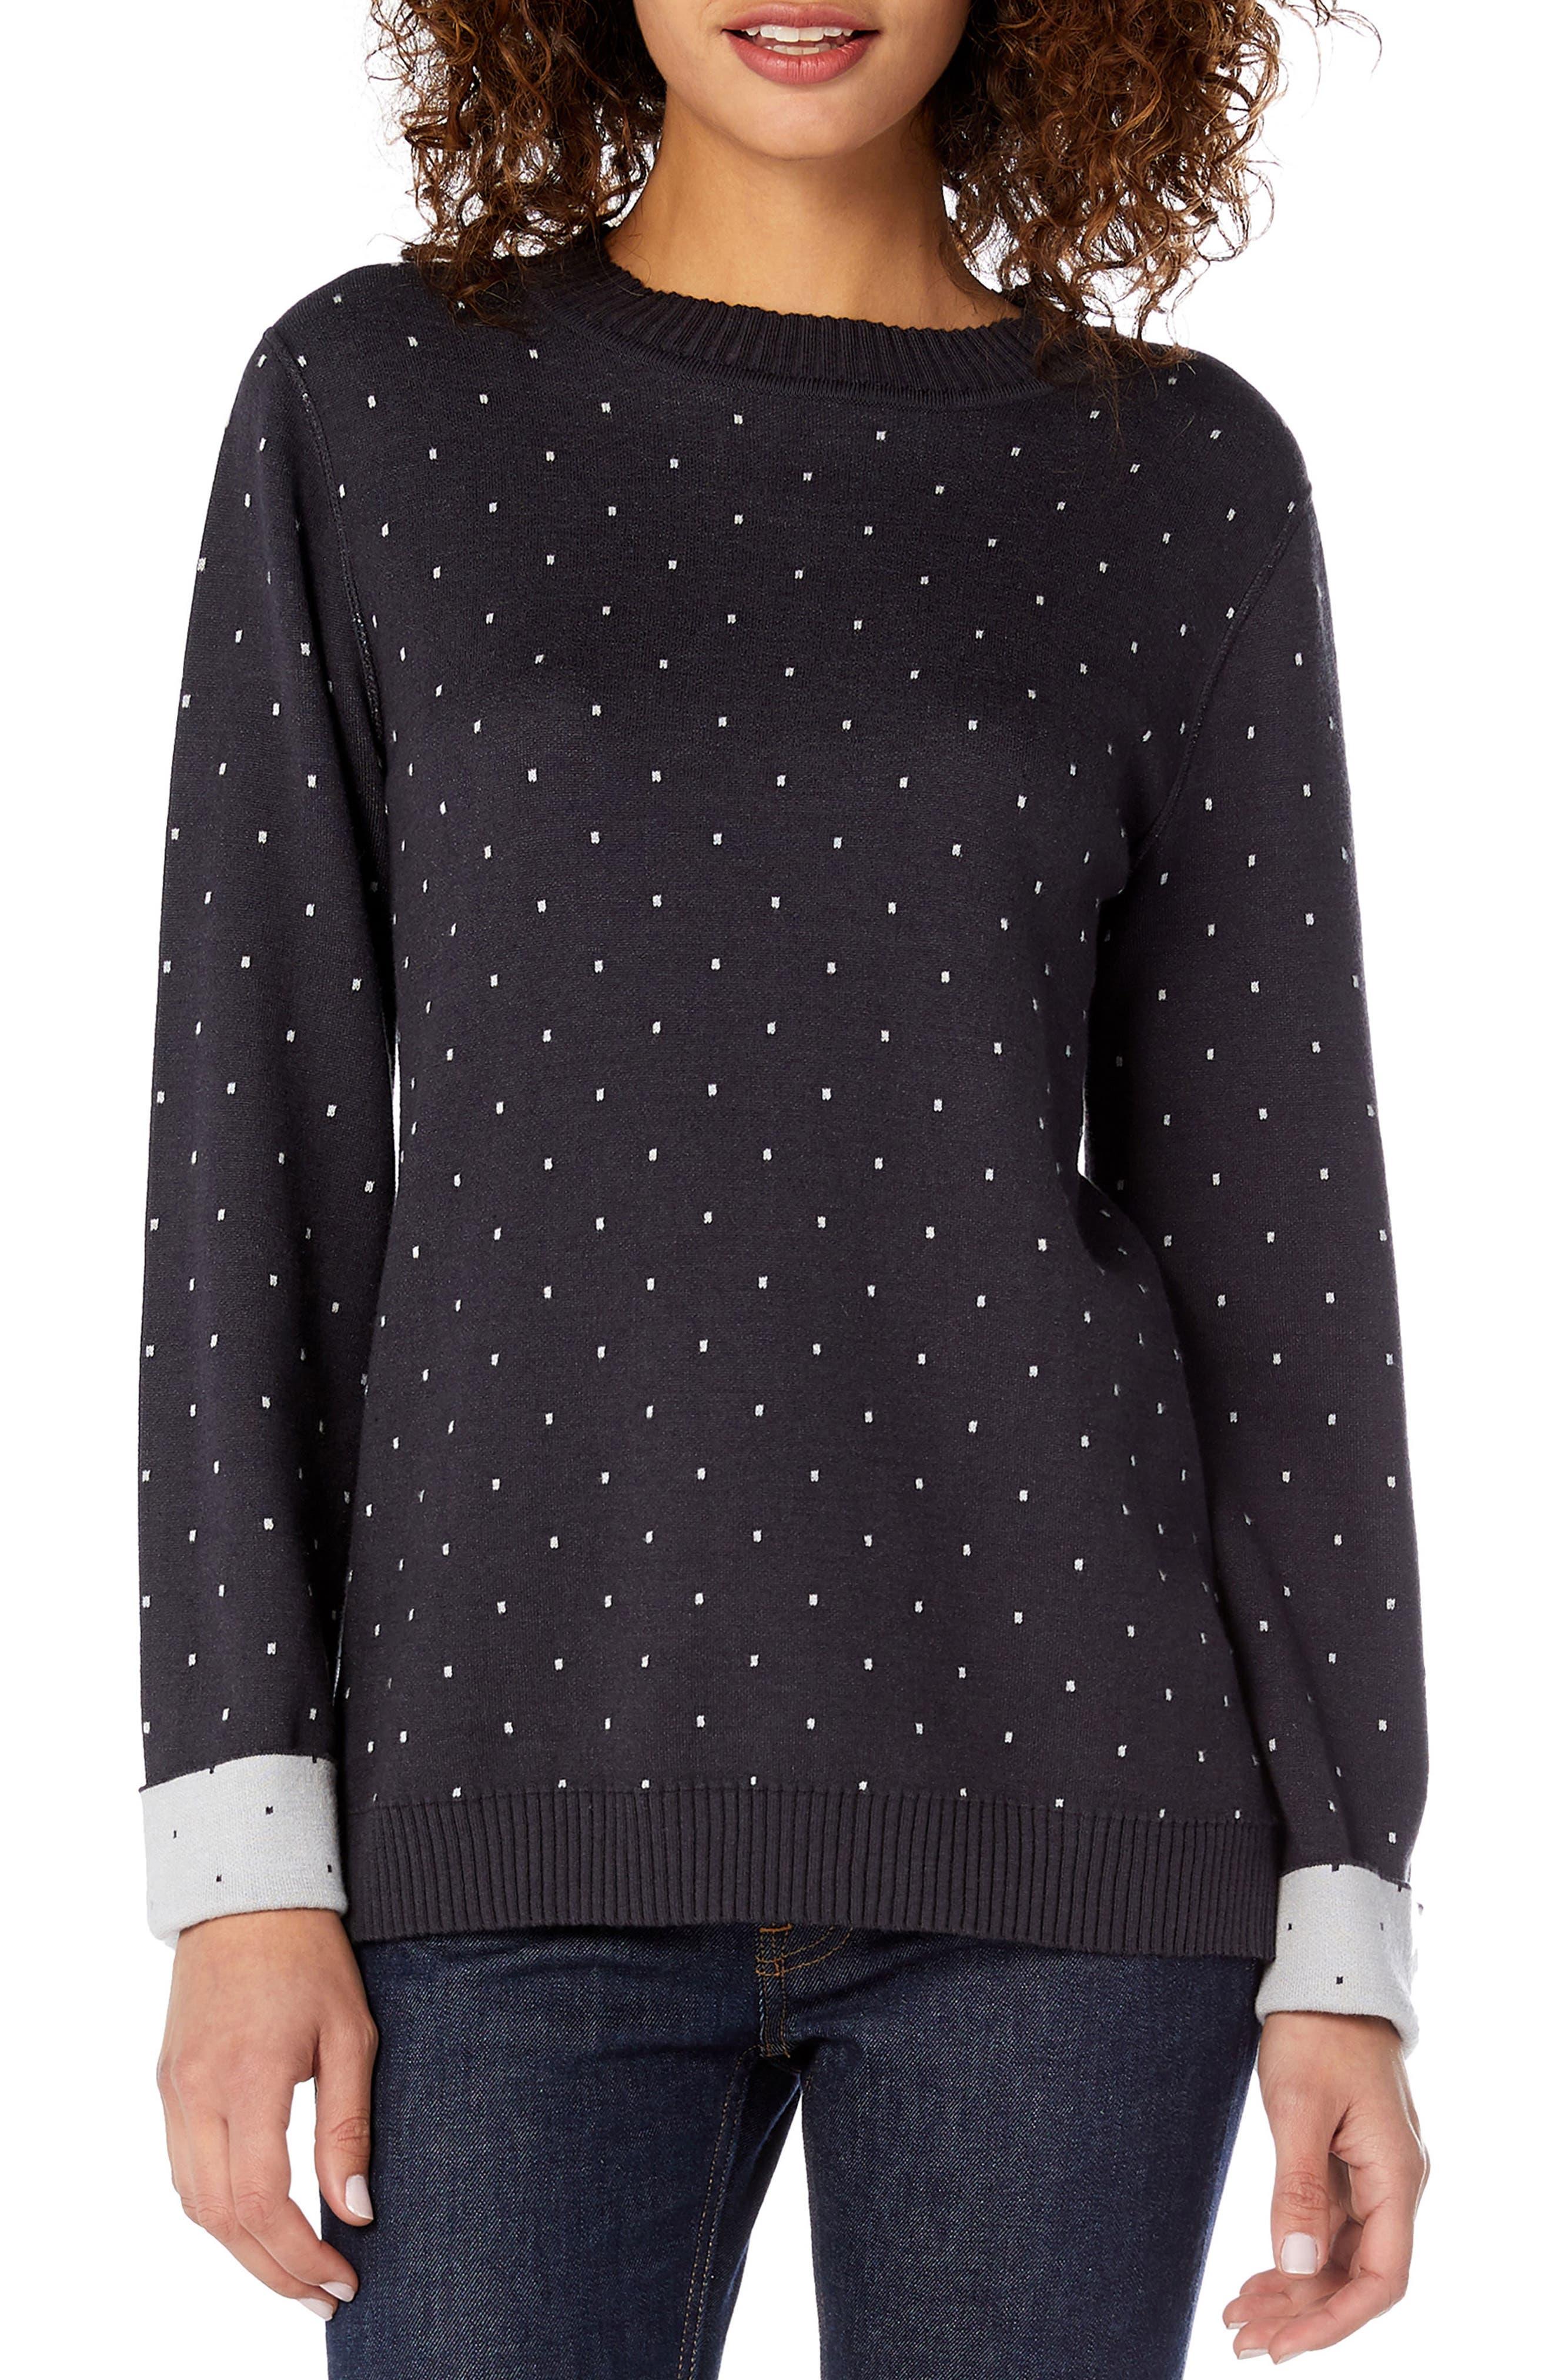 MICHAEL STARS Reversible Dot Cotton Blend Sweater in Black/ Chalk